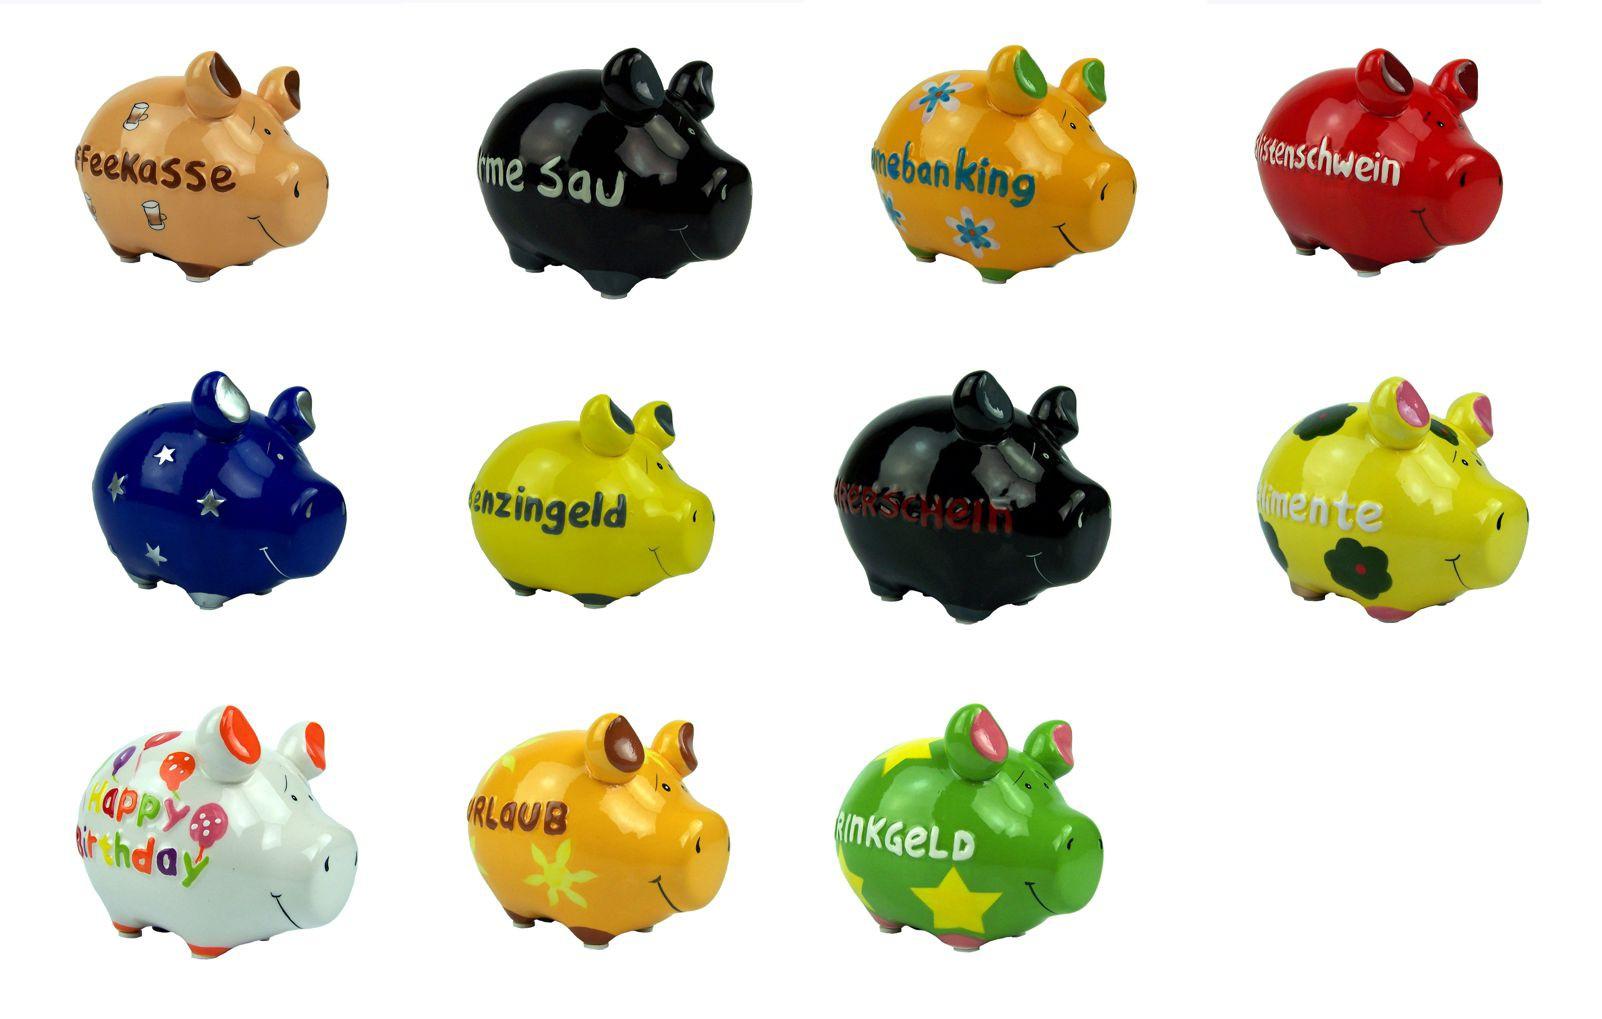 lange keramik KCG Spardose, Sparschwein, Moneybank. große Auswahl. 12 cm. lang  lange keramik